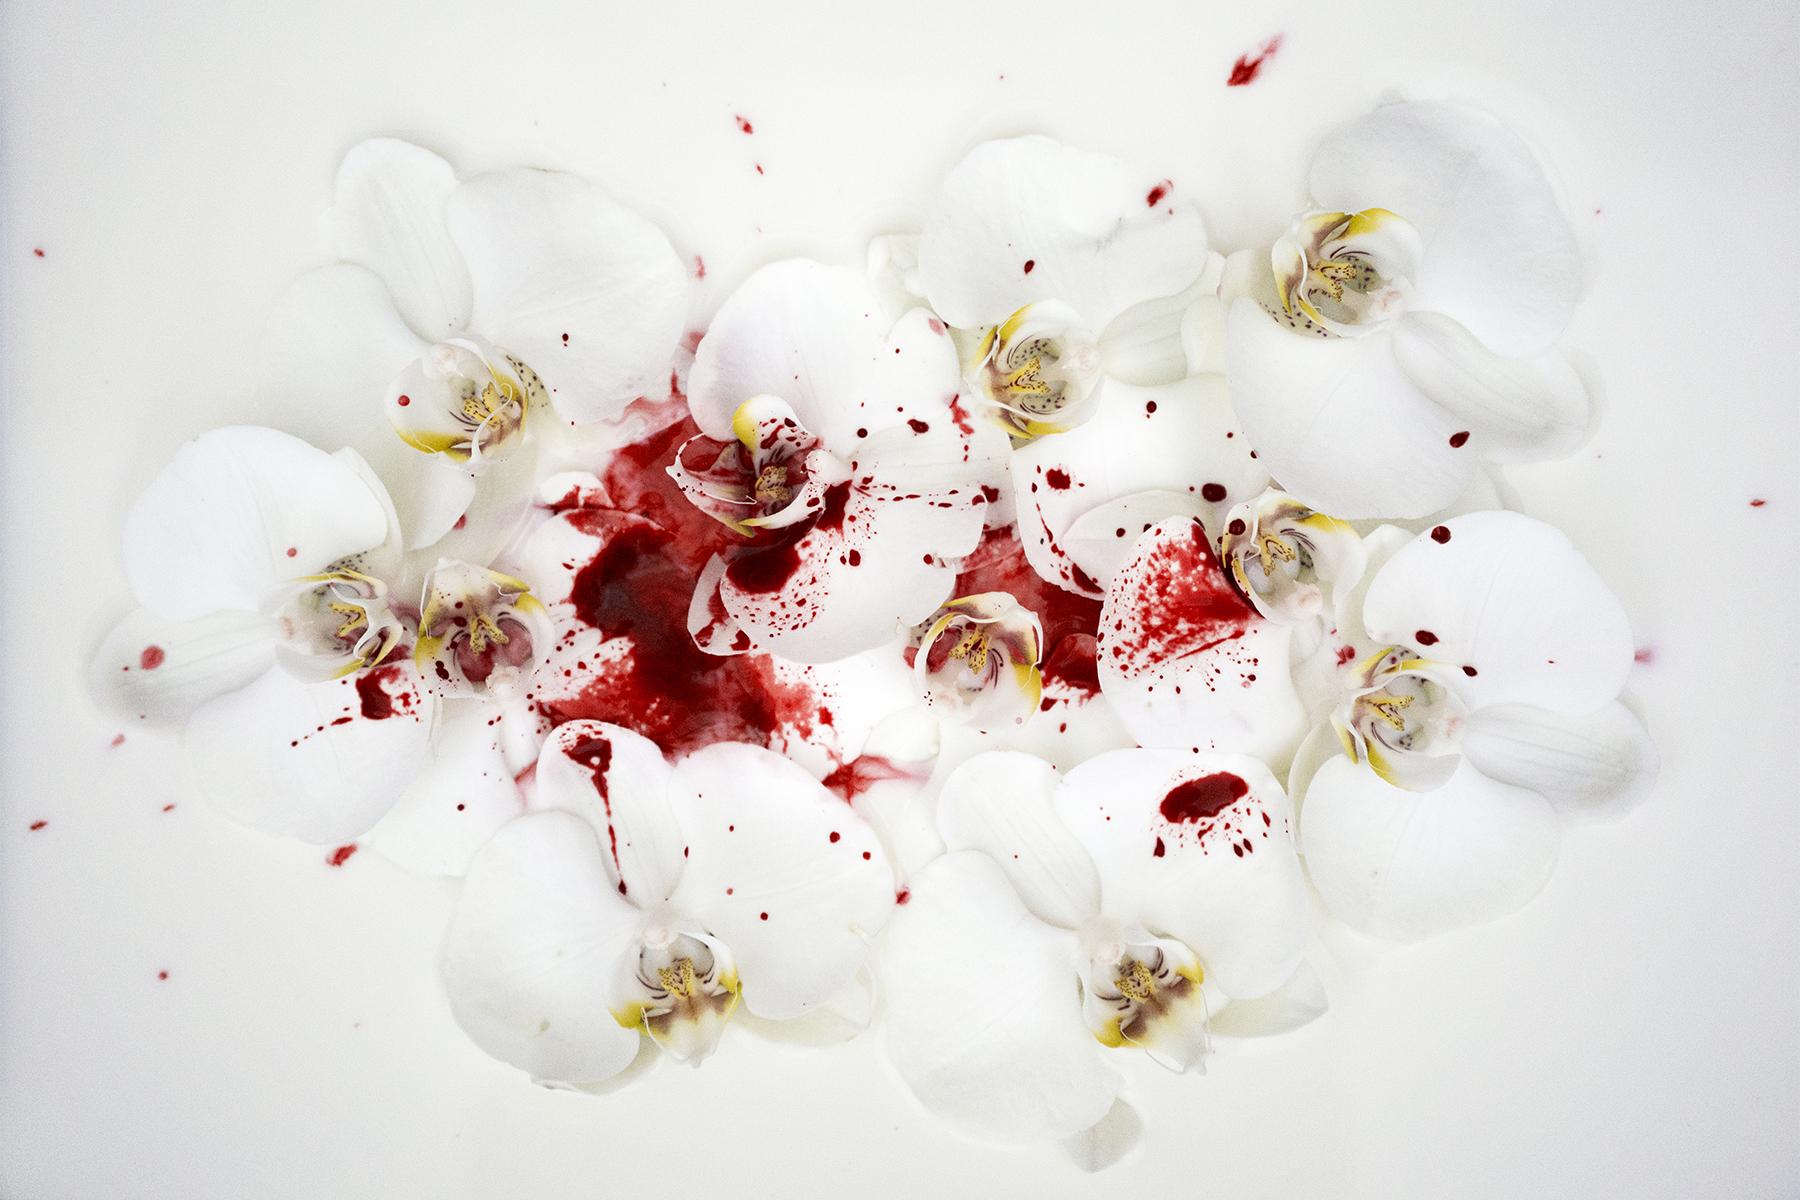 DSC05200.flowers-lnd-2018-sm.jpg